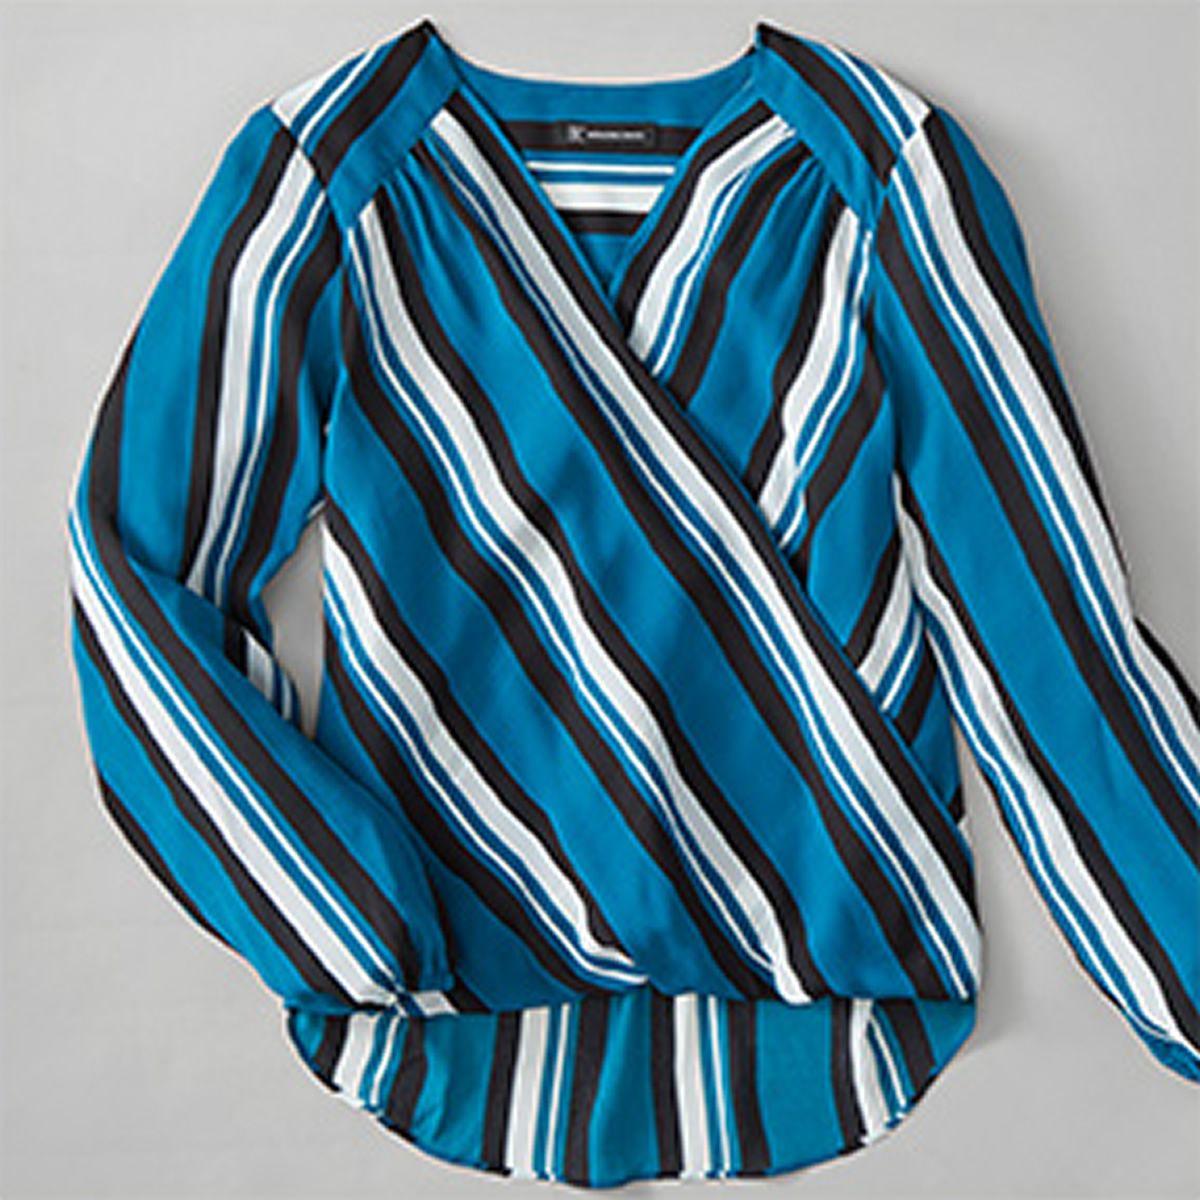 e67efe0d1f0 Petite Clothing - Petite Women s Clothing   Fashion - Macy s